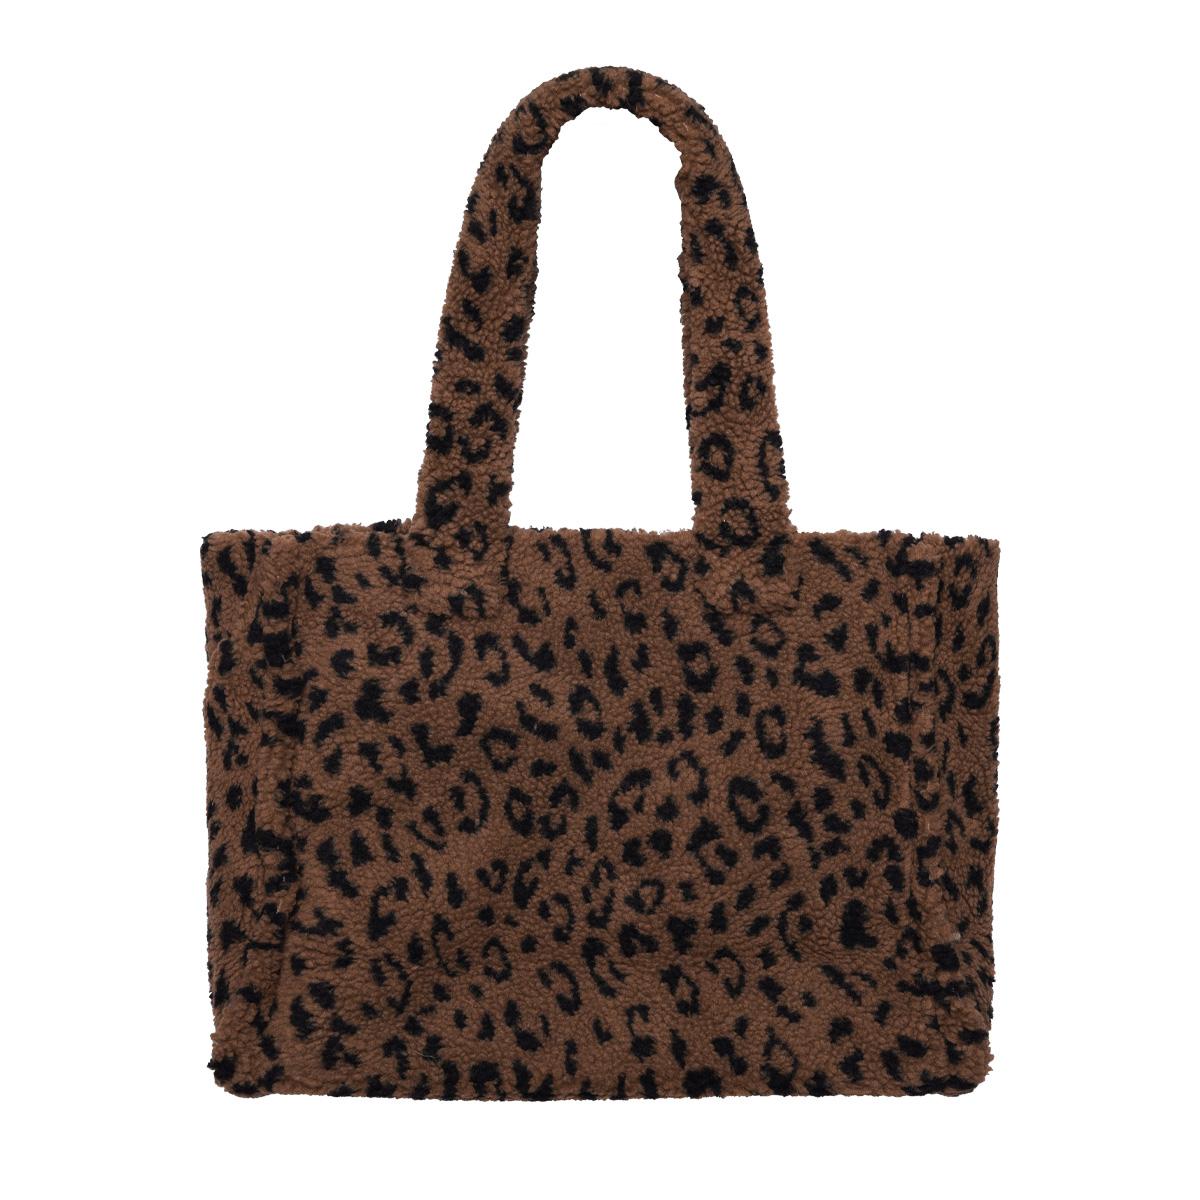 Tote de borreguito de leopardo